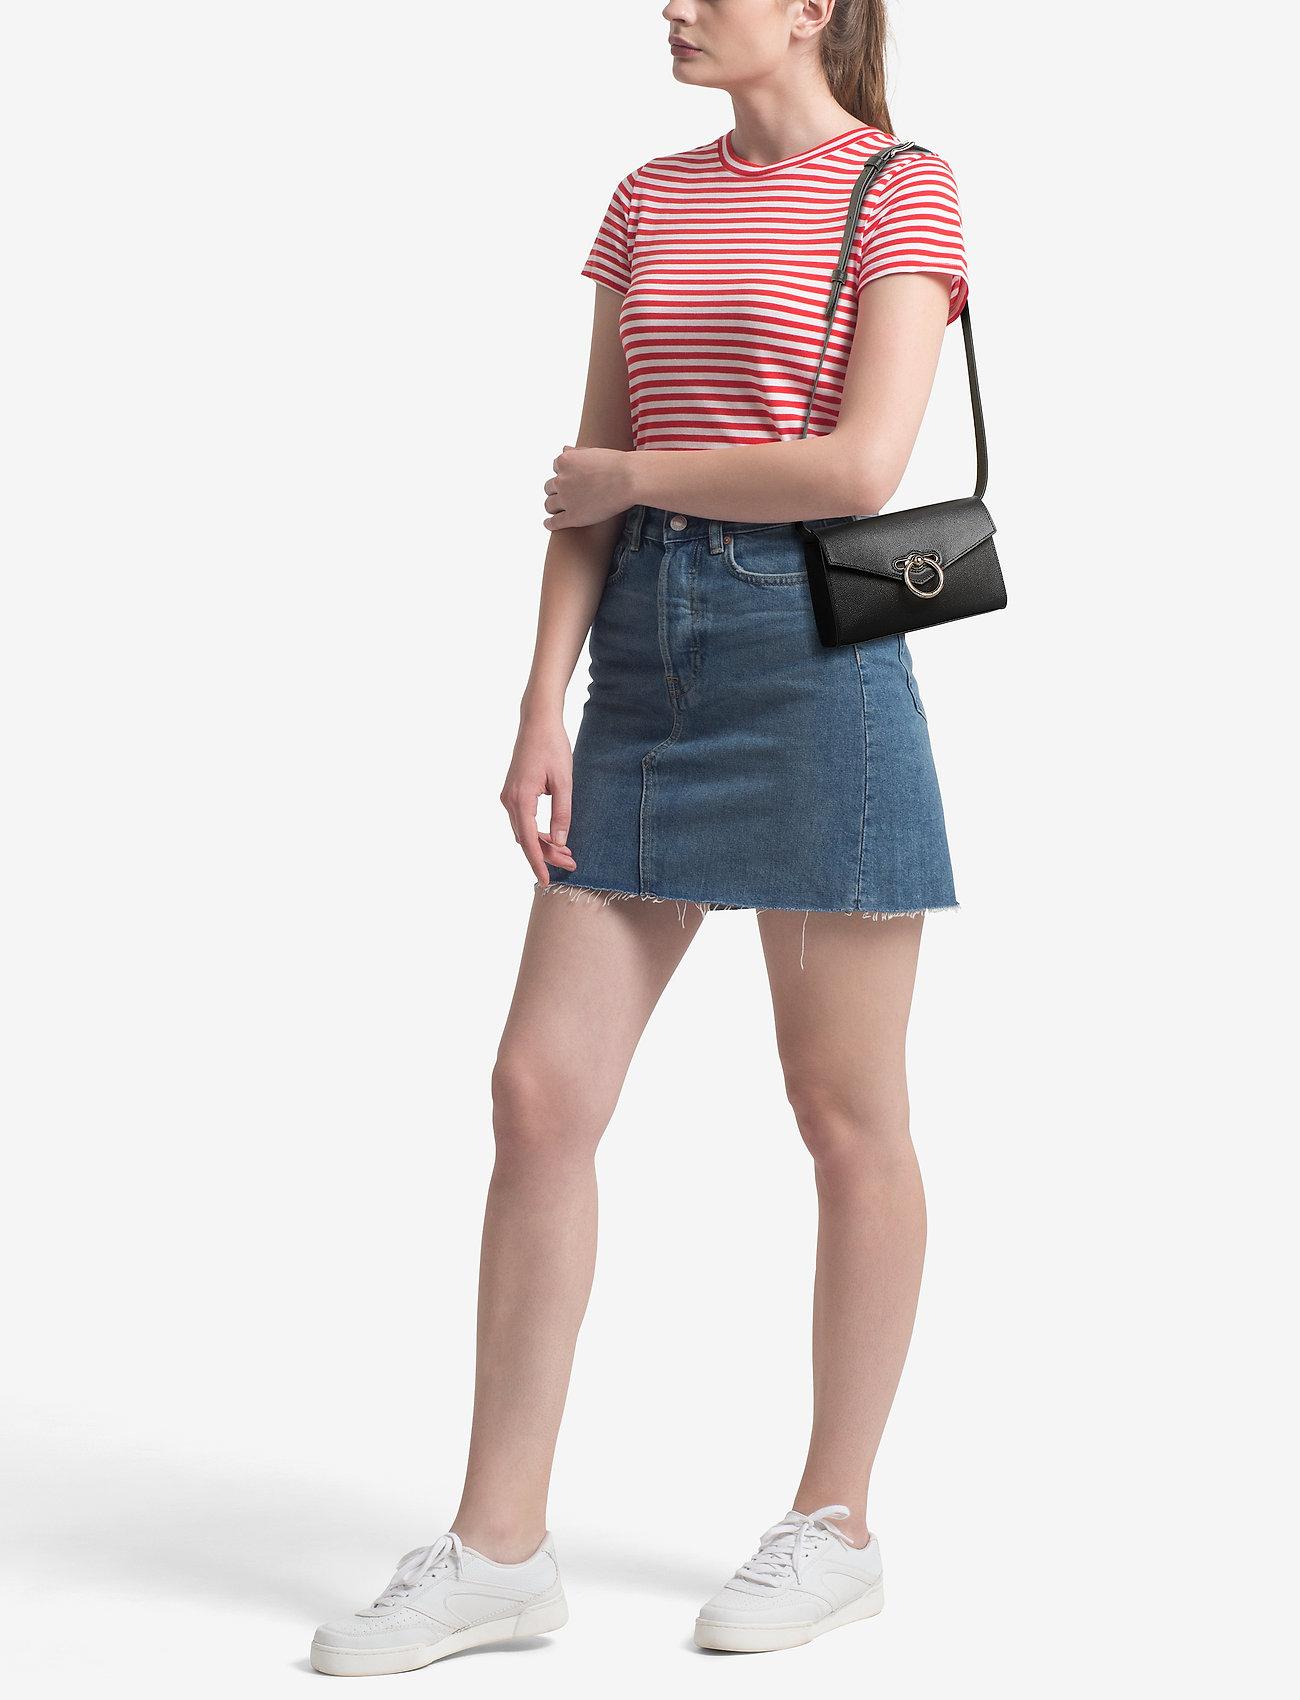 Rebecca Minkoff Jean Belt Bag Caviar   Magväskor